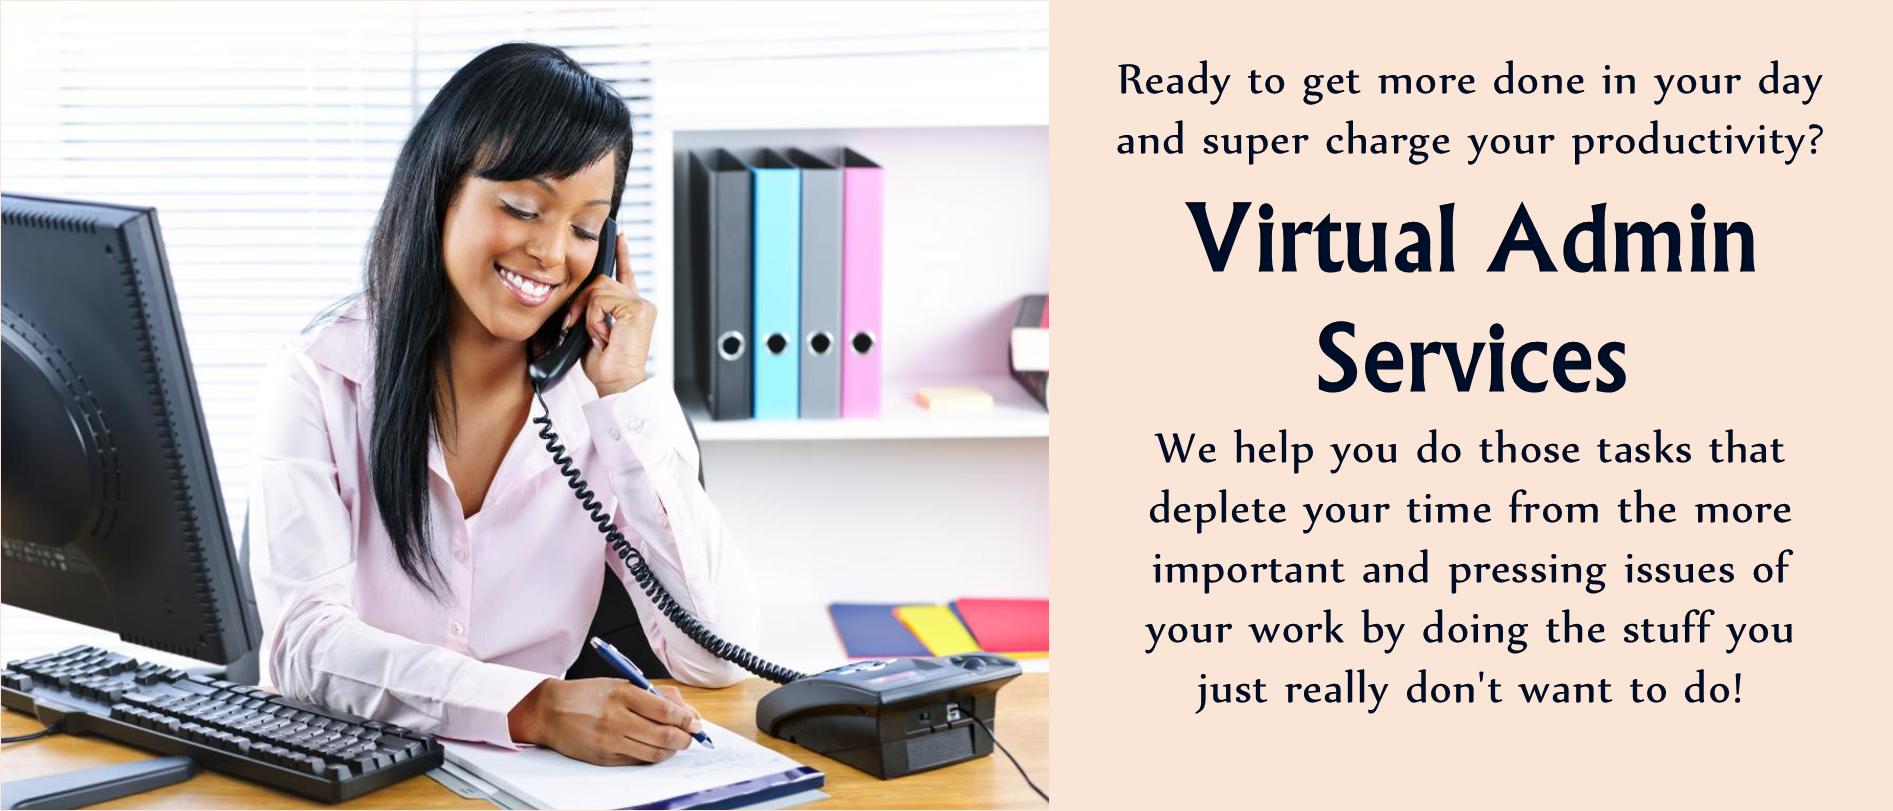 Virtual Admin Services.png